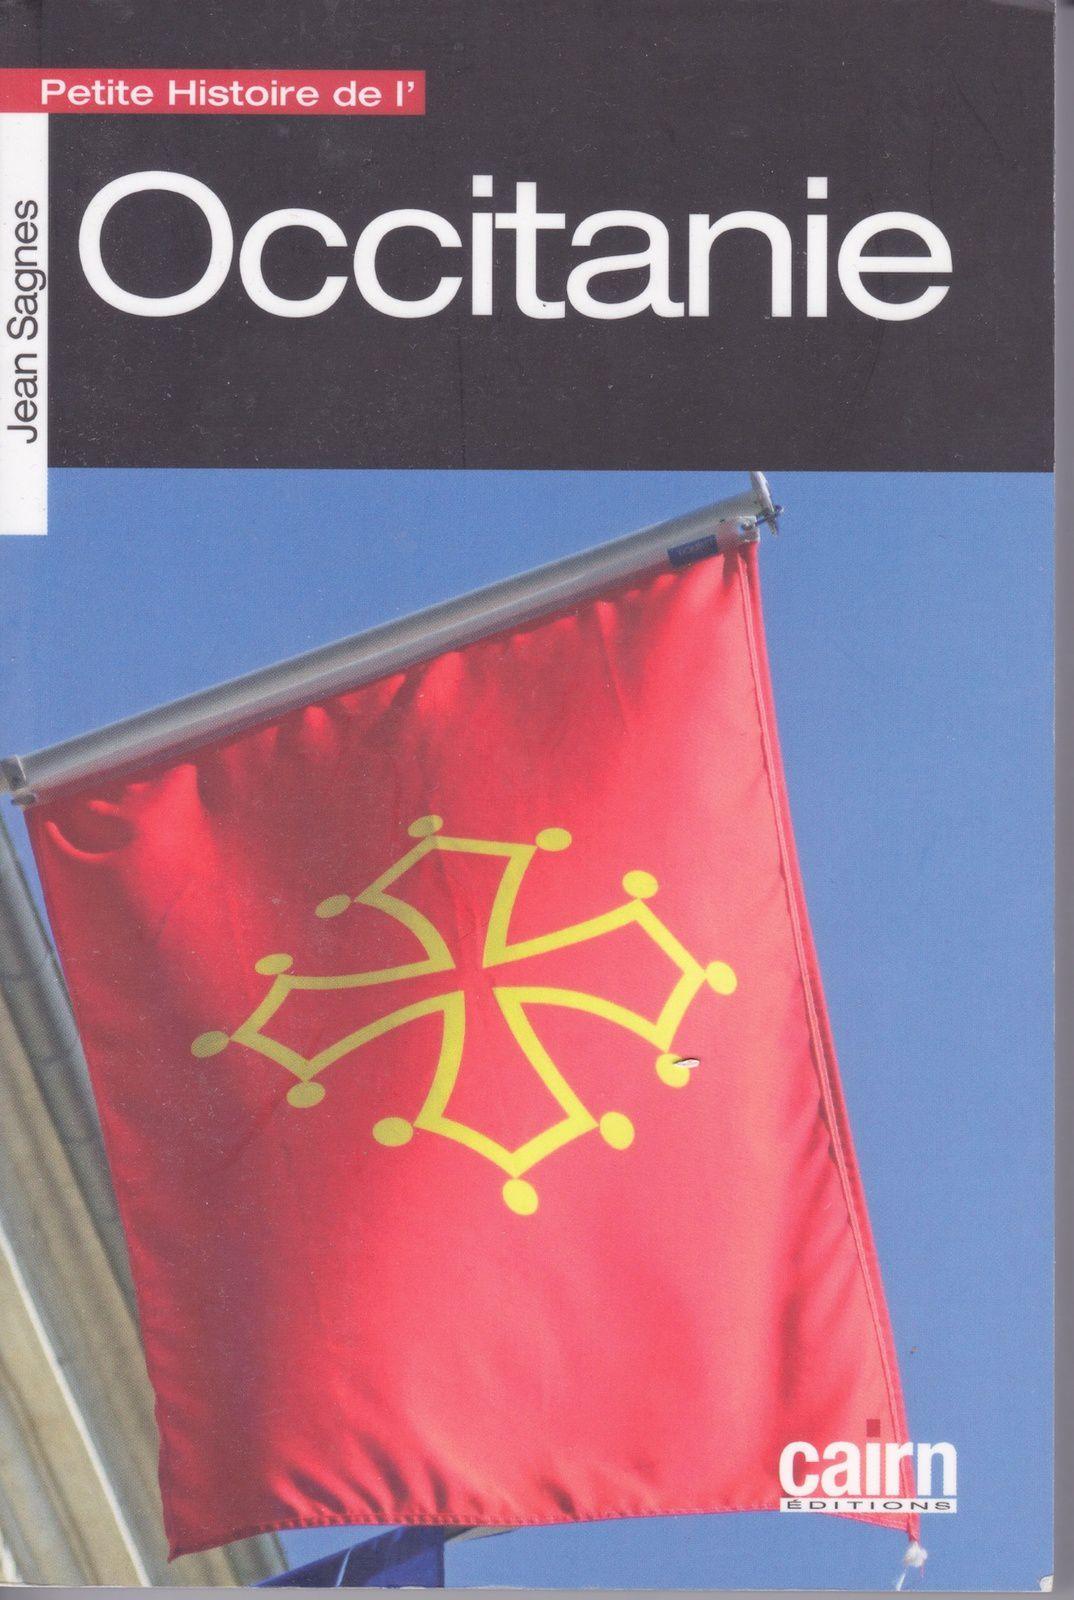 «Petite histoire de l'Occitanie» de Joan Sagnes